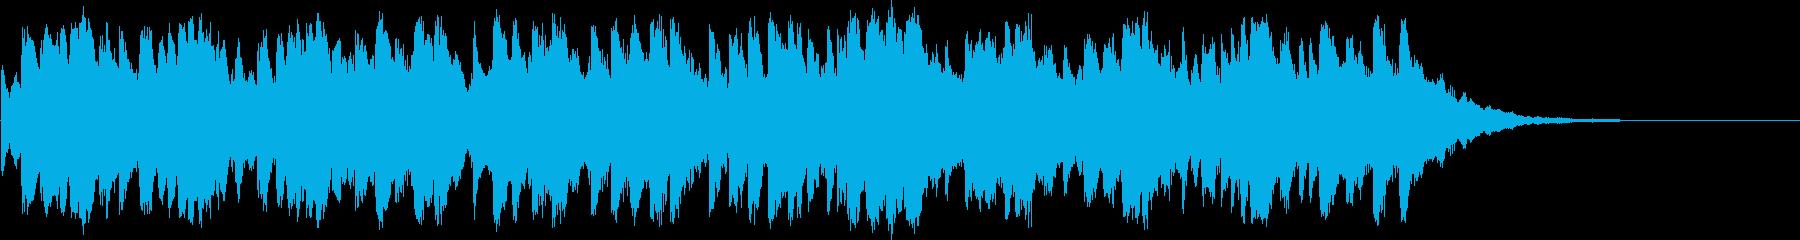 Xmasソングで人気のある曲をの再生済みの波形